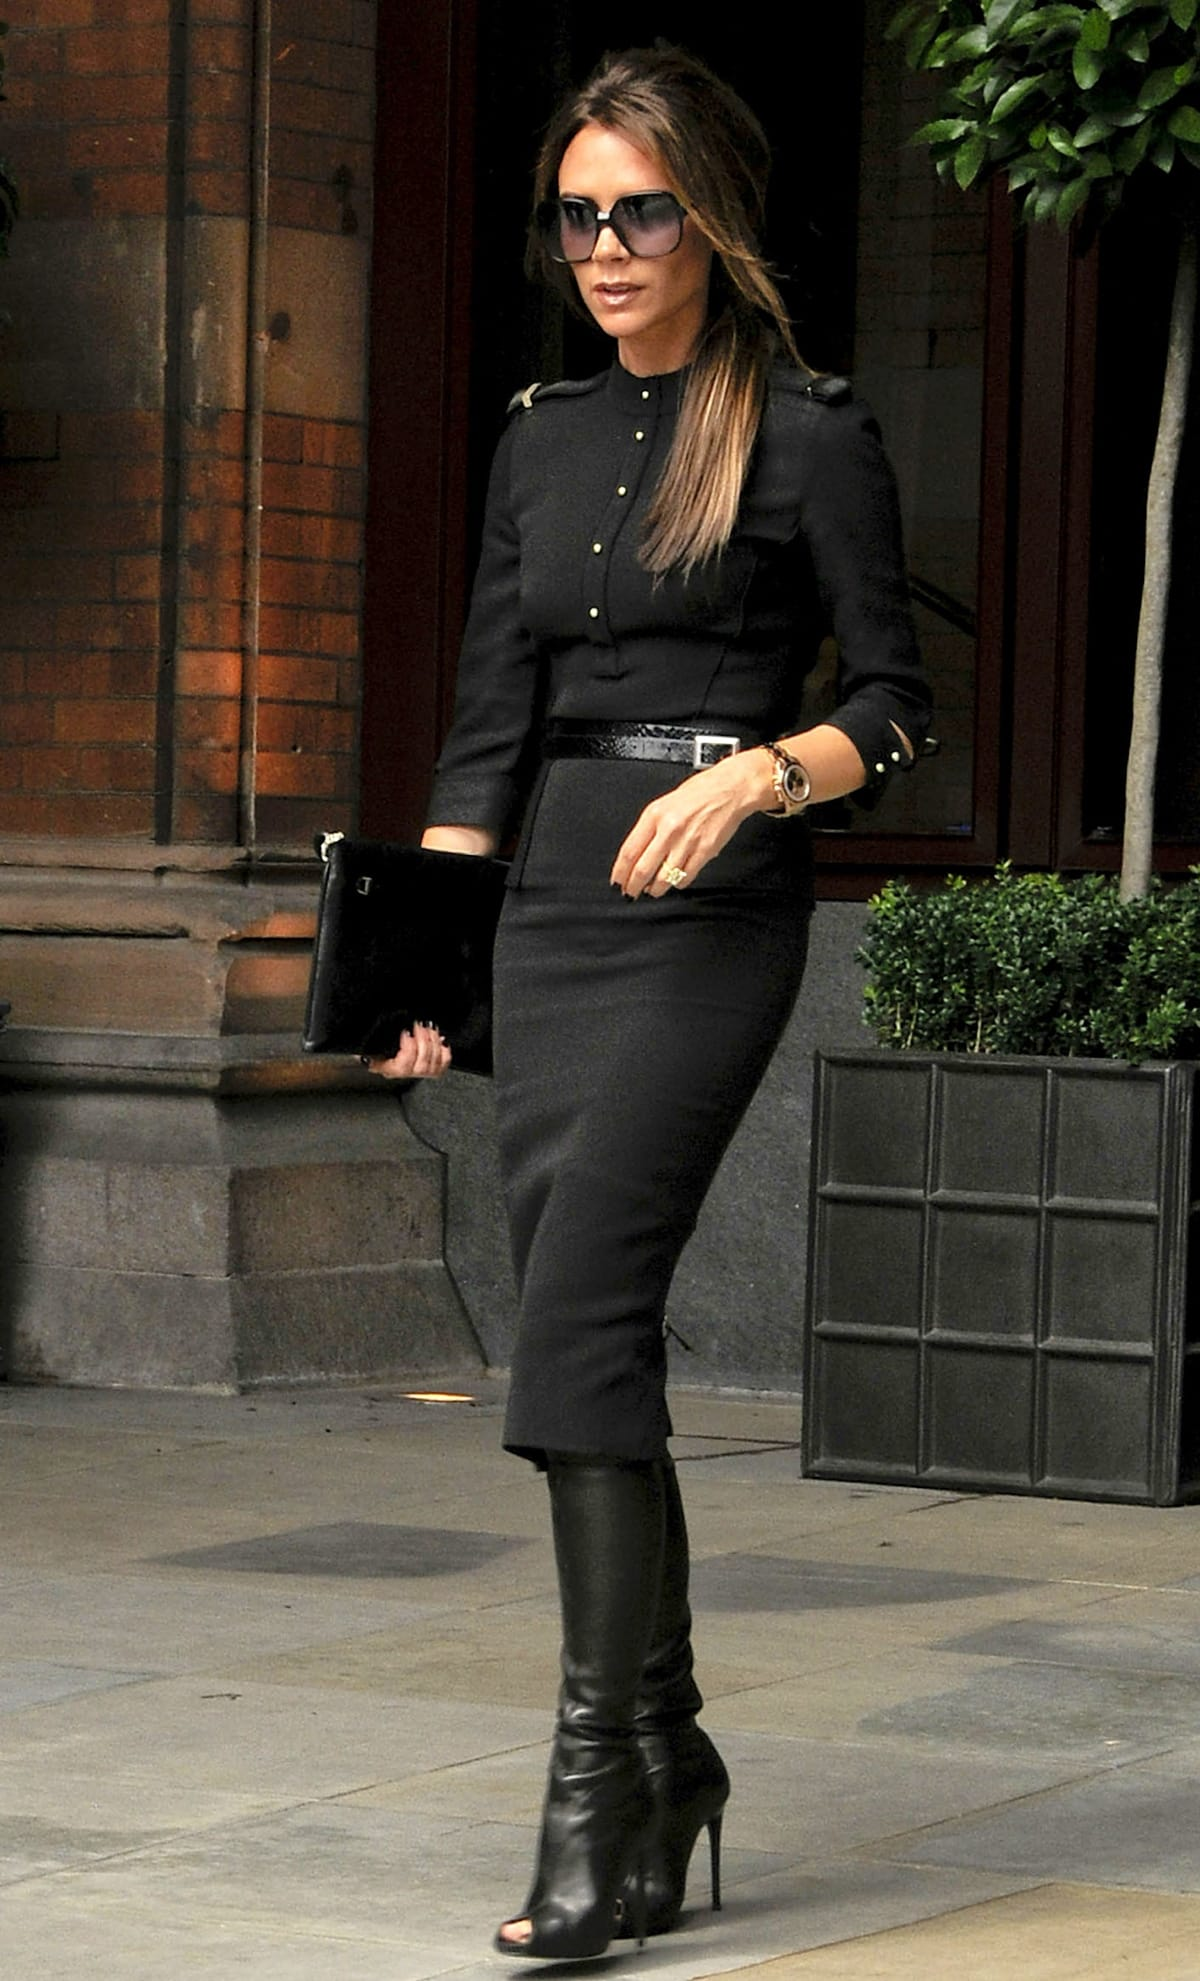 Victoria Beckham leaves the majestic St Pancras Renaissance Hotel in London